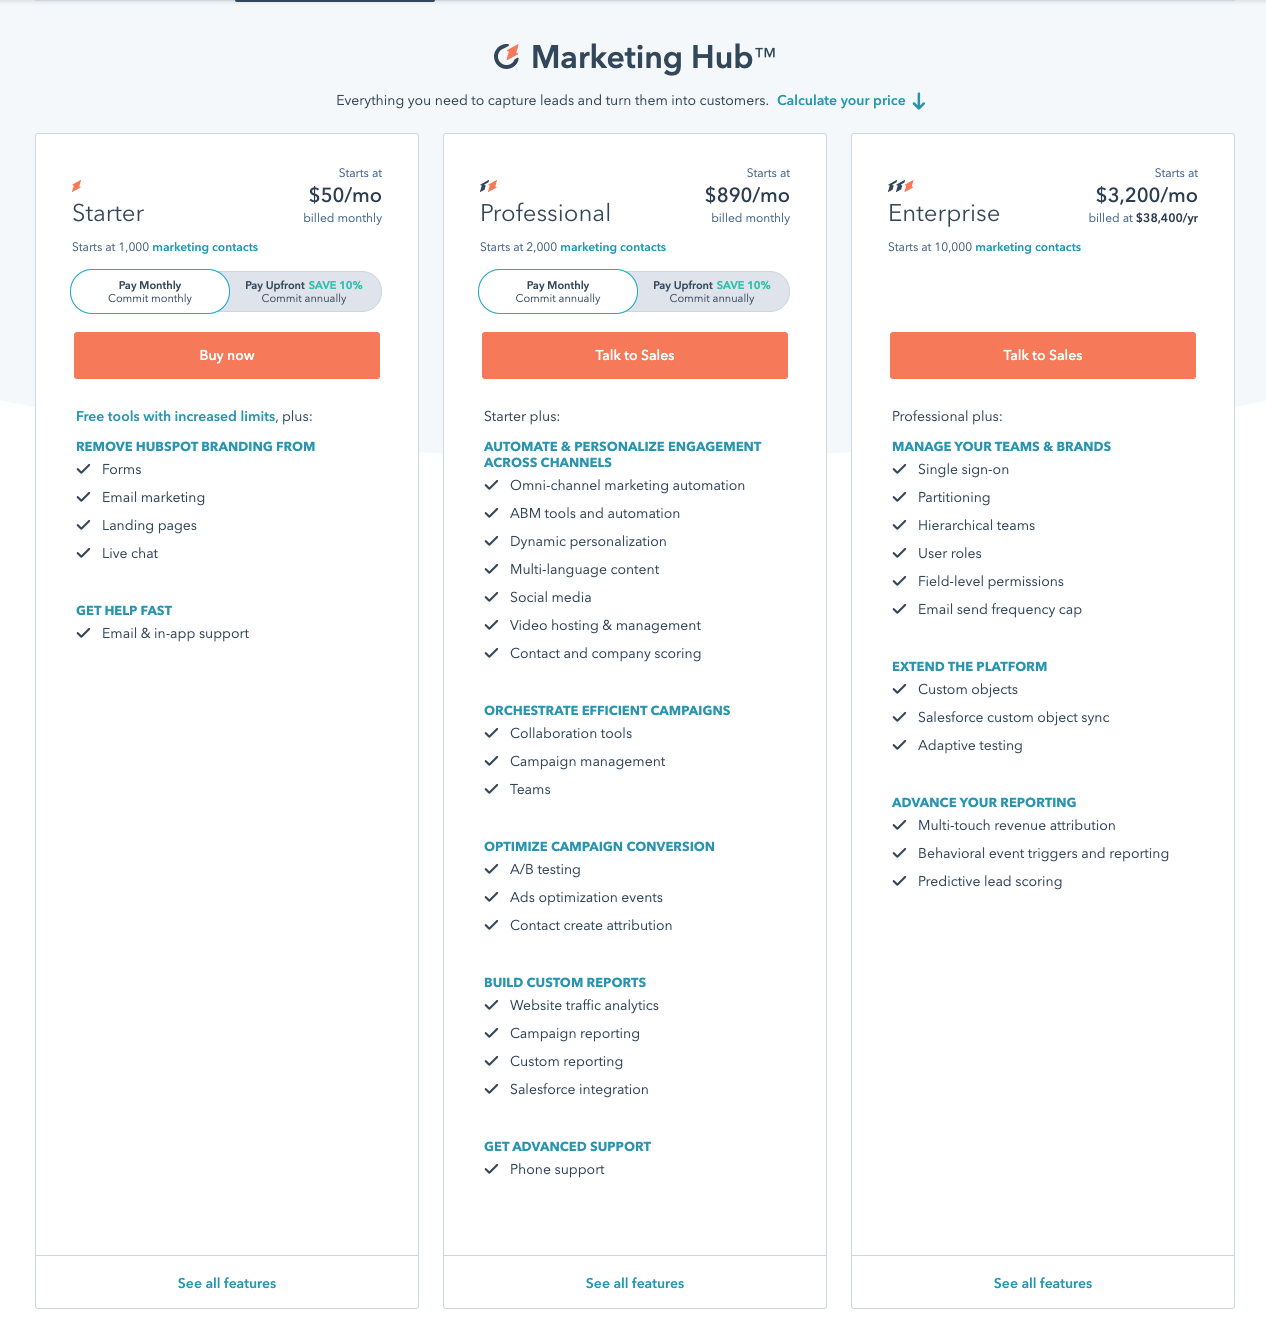 HubSpot Marketing Hub Pricing Page